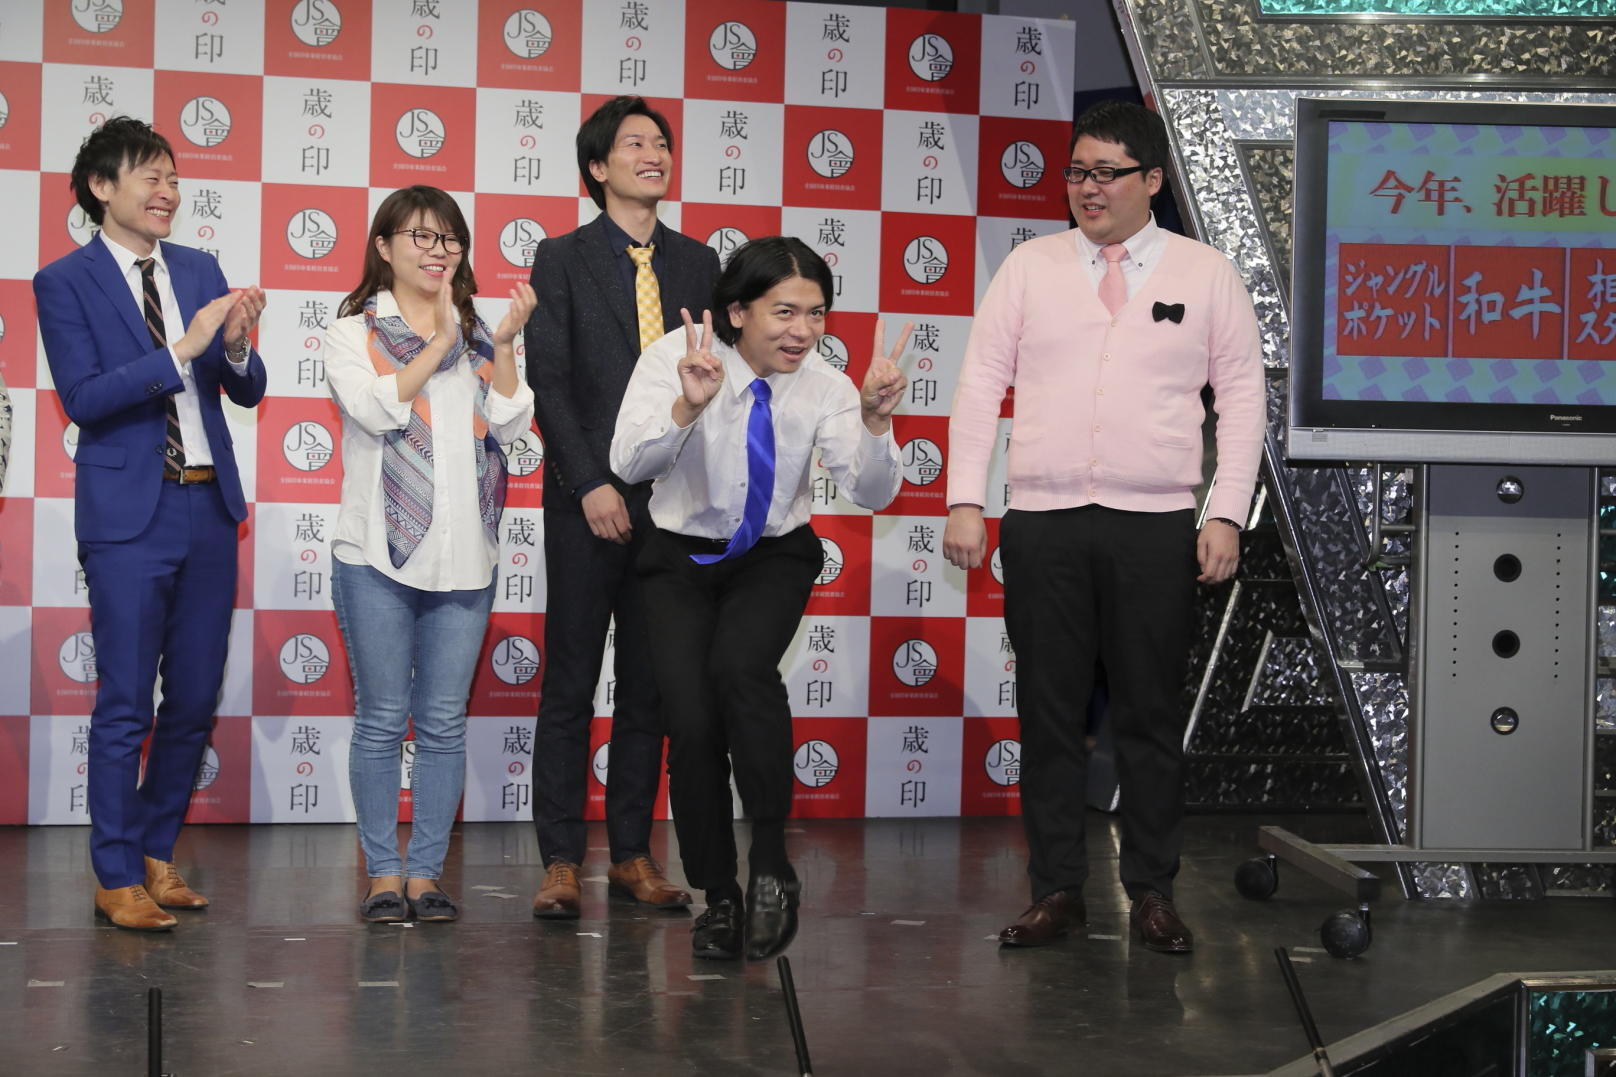 http://news.yoshimoto.co.jp/20171204171843-5a2008b09876509a6c1555b80a3c87574cc9a101.jpg